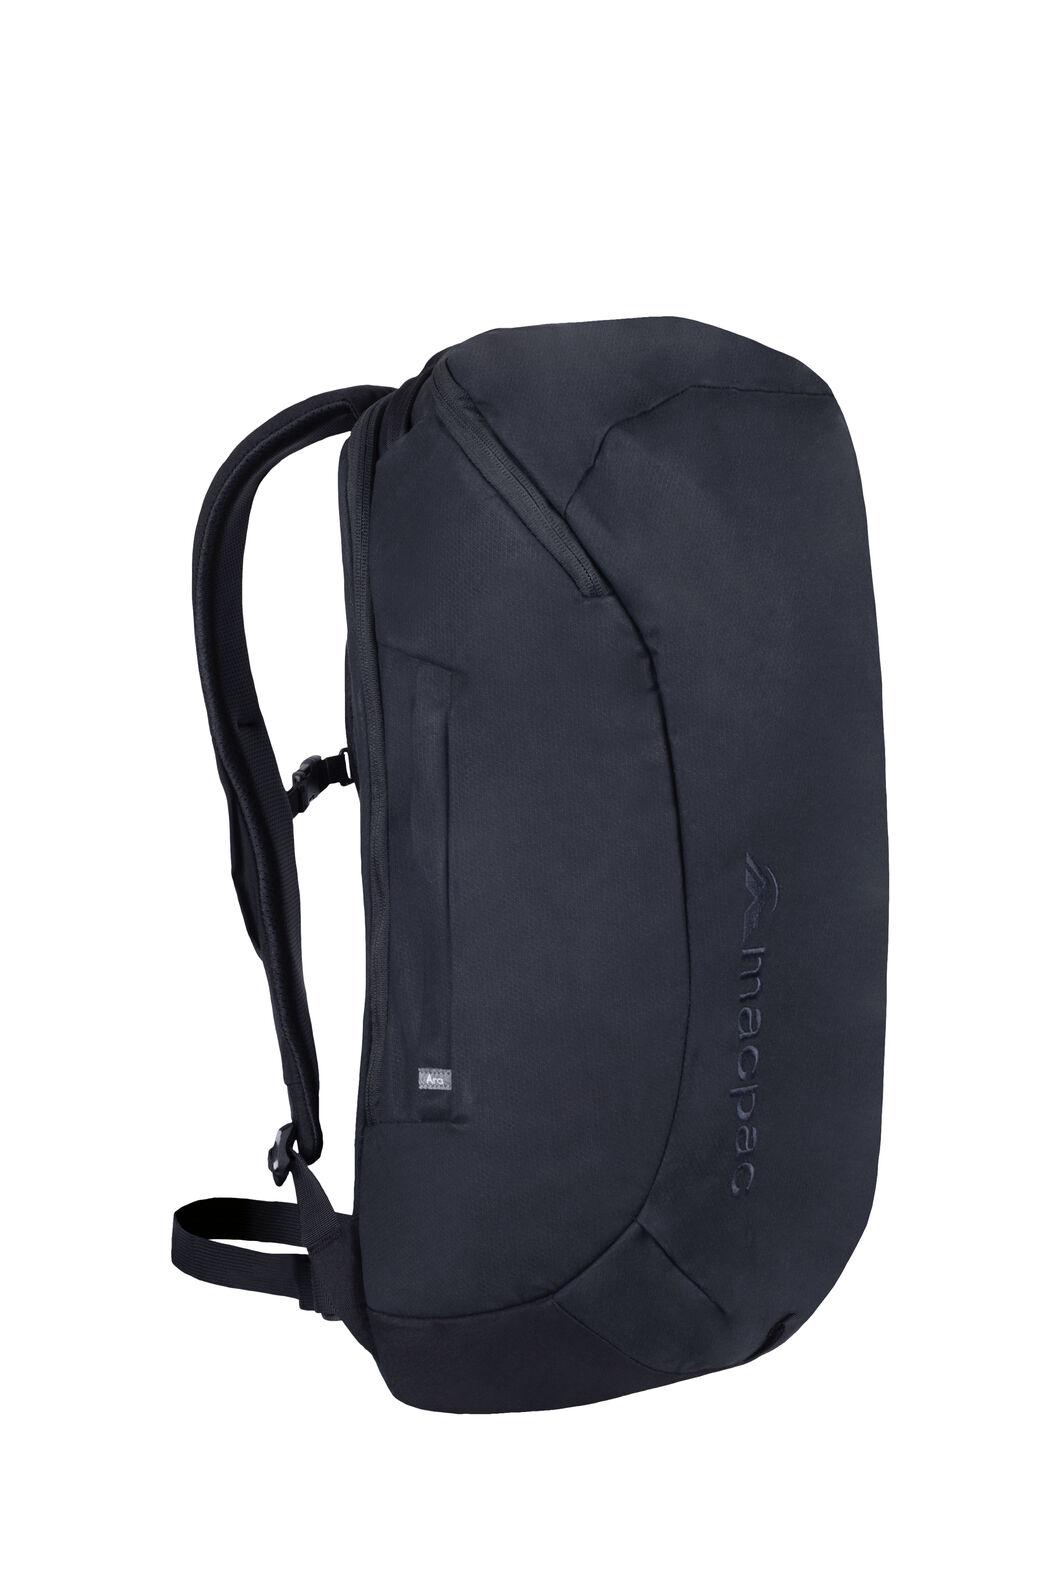 Macpac Ara 25L AzTec® Backpack, Black, hi-res